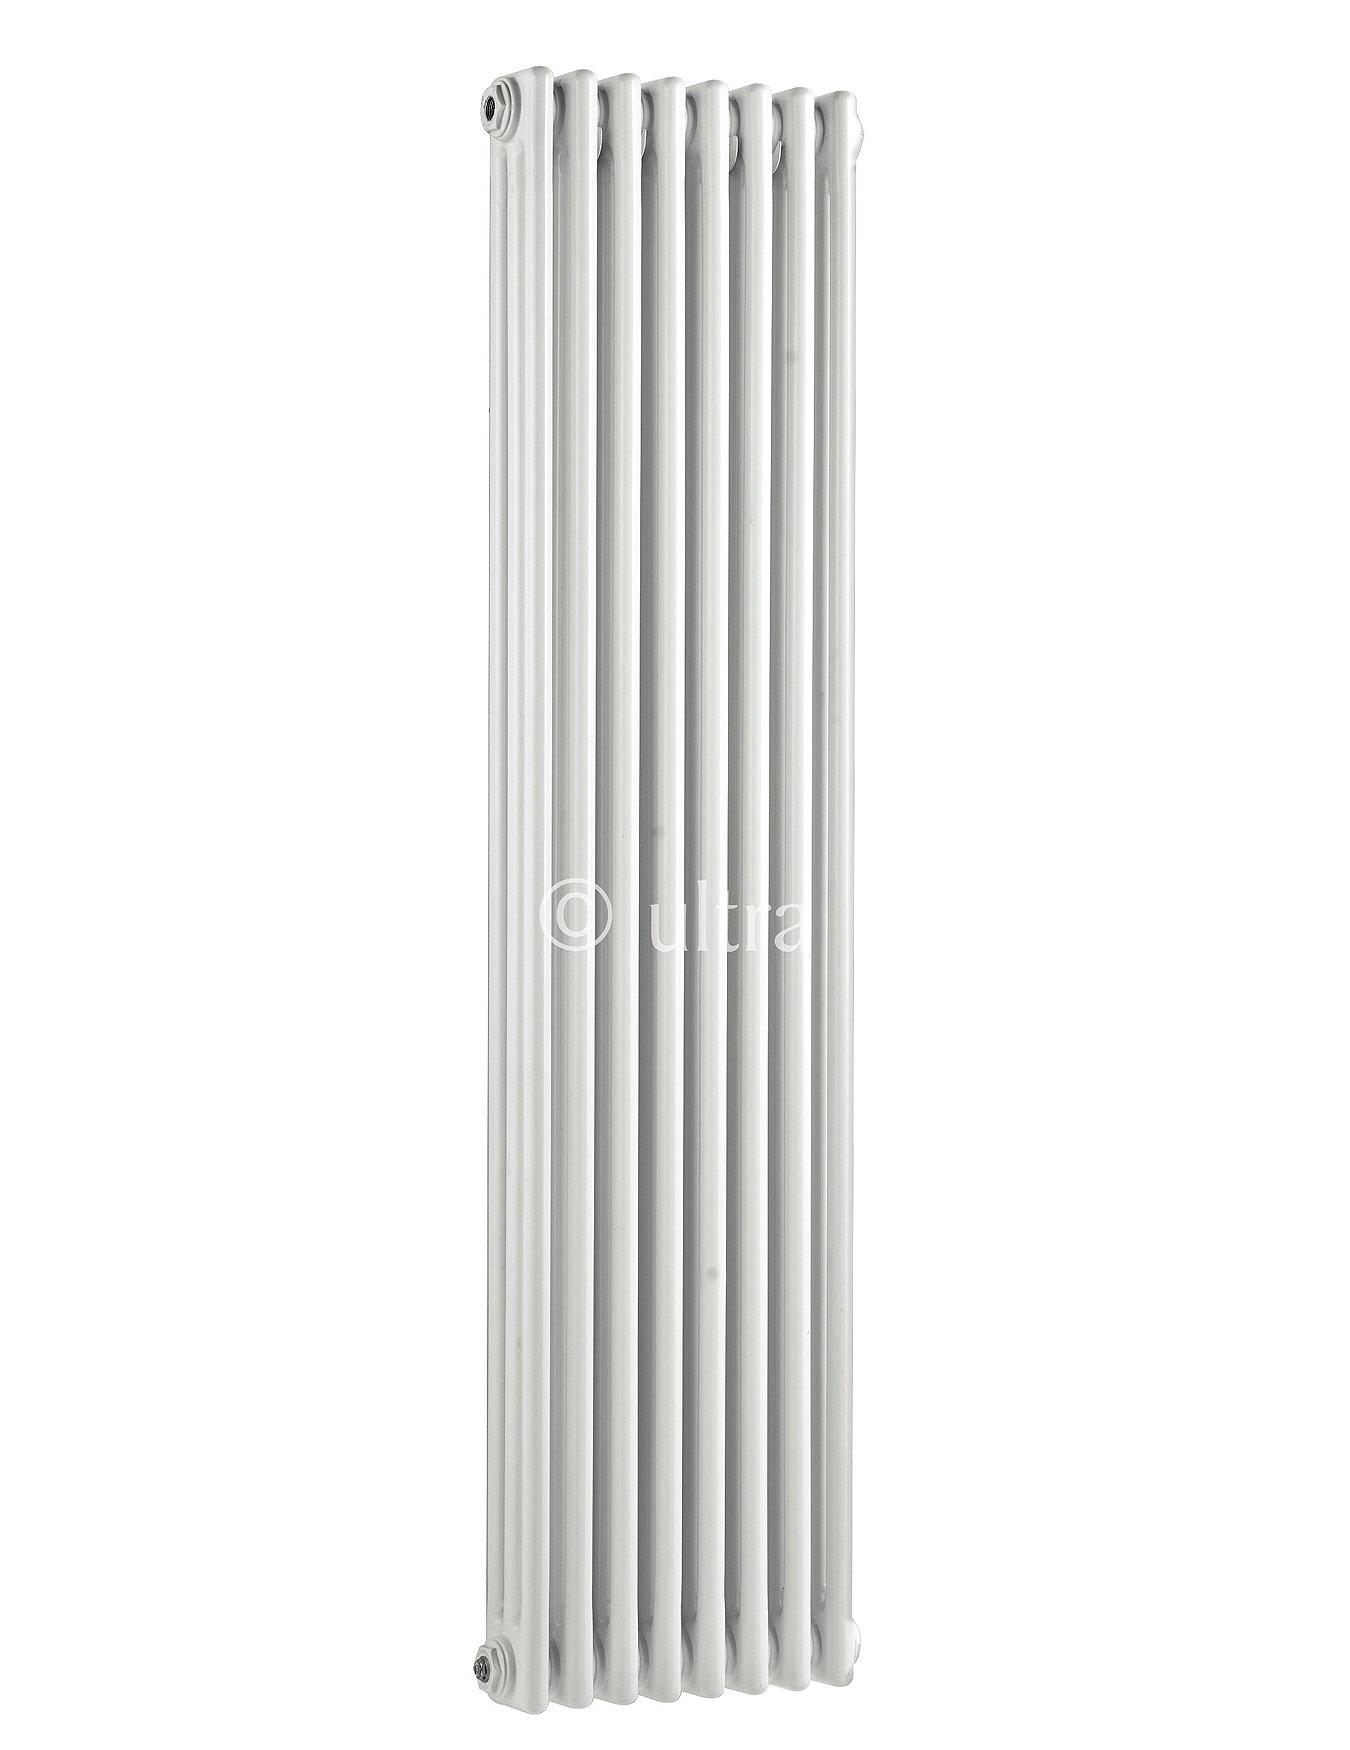 Ultra Colosseum White Finish Triple Column Radiator 1800 X